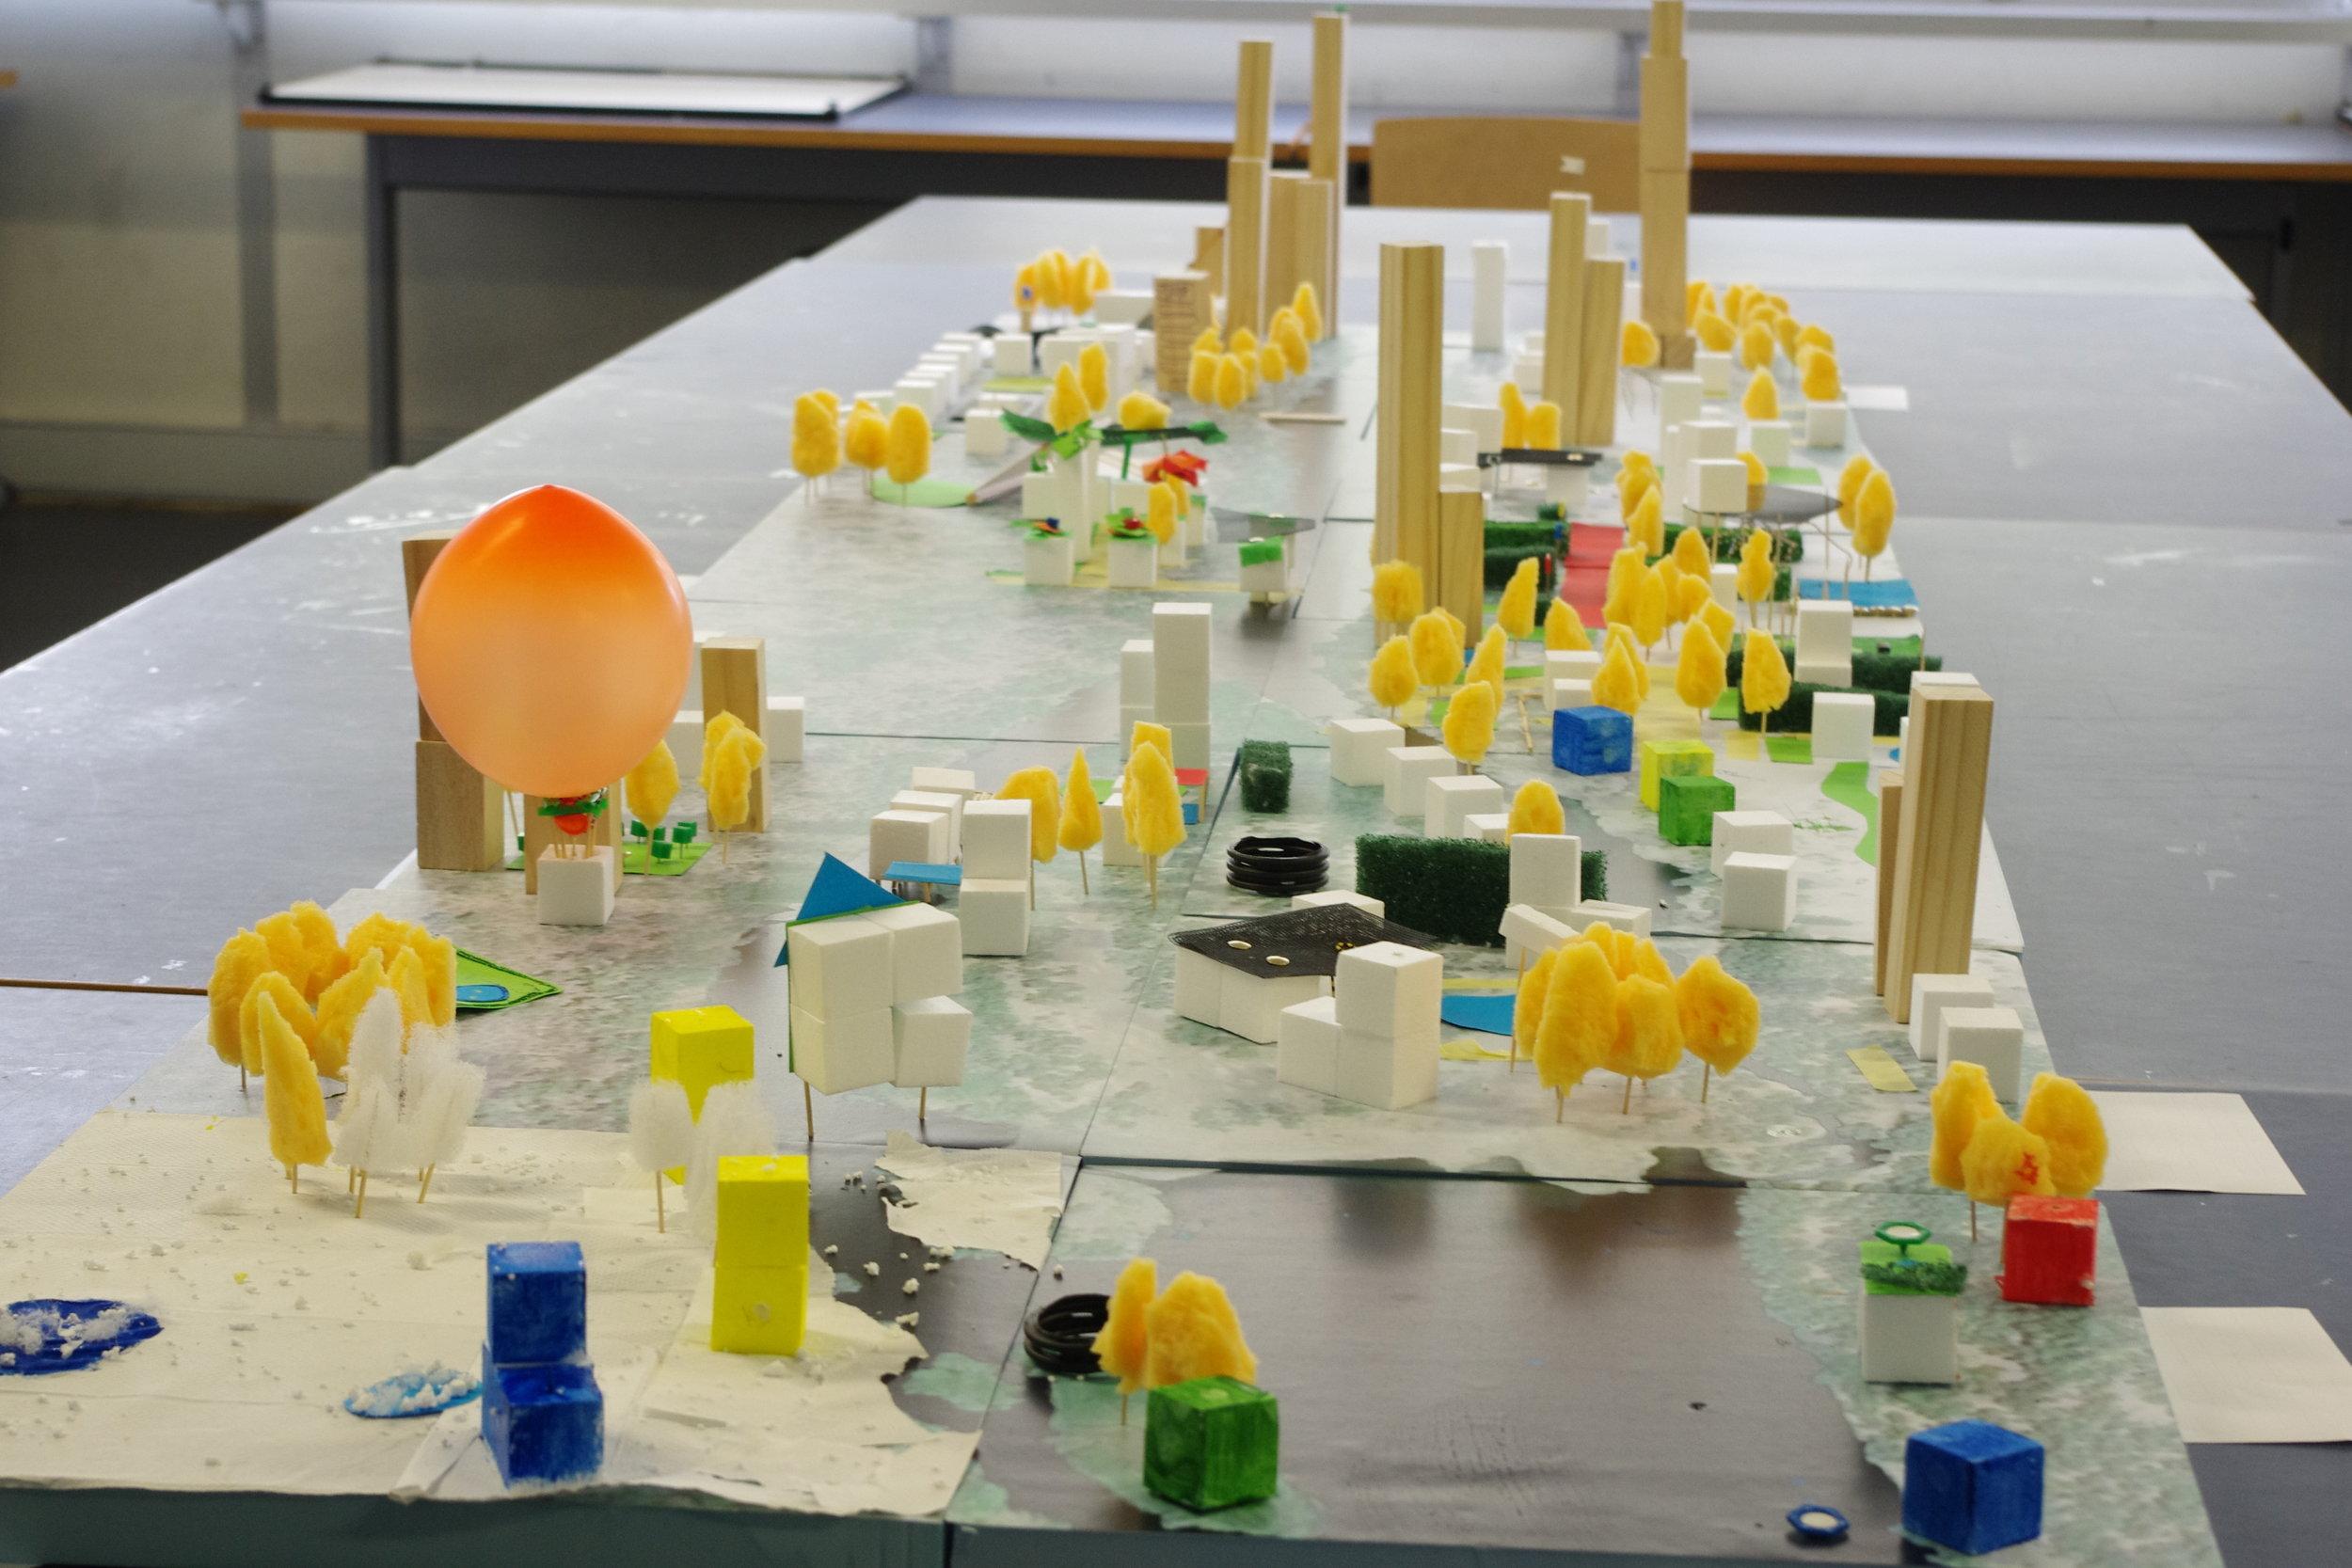 Future Cities lab